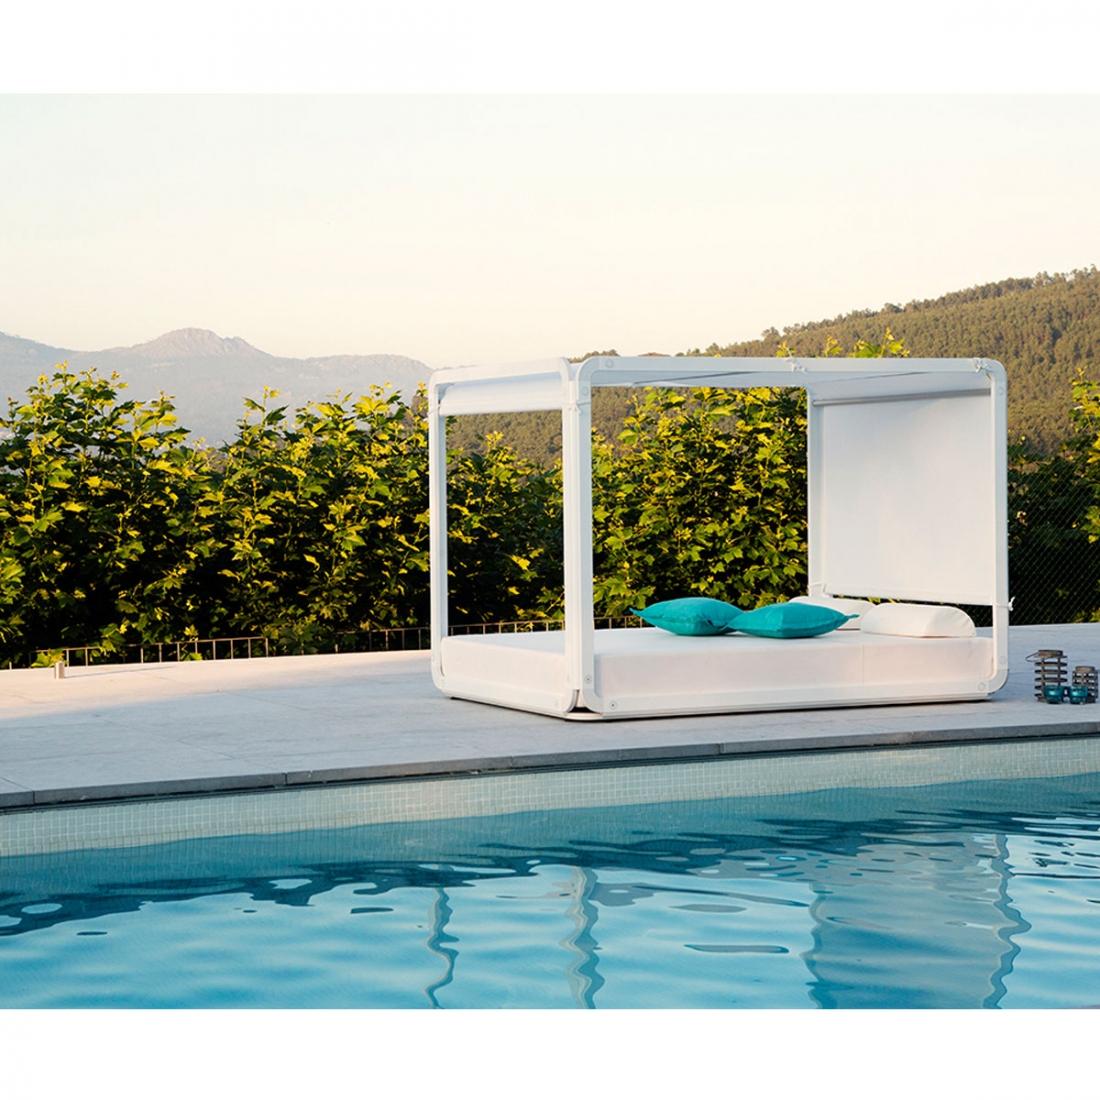 Lit Exterieur Design lit-pergola-daybed-ibiza-ezpeleta2 - deco maison design